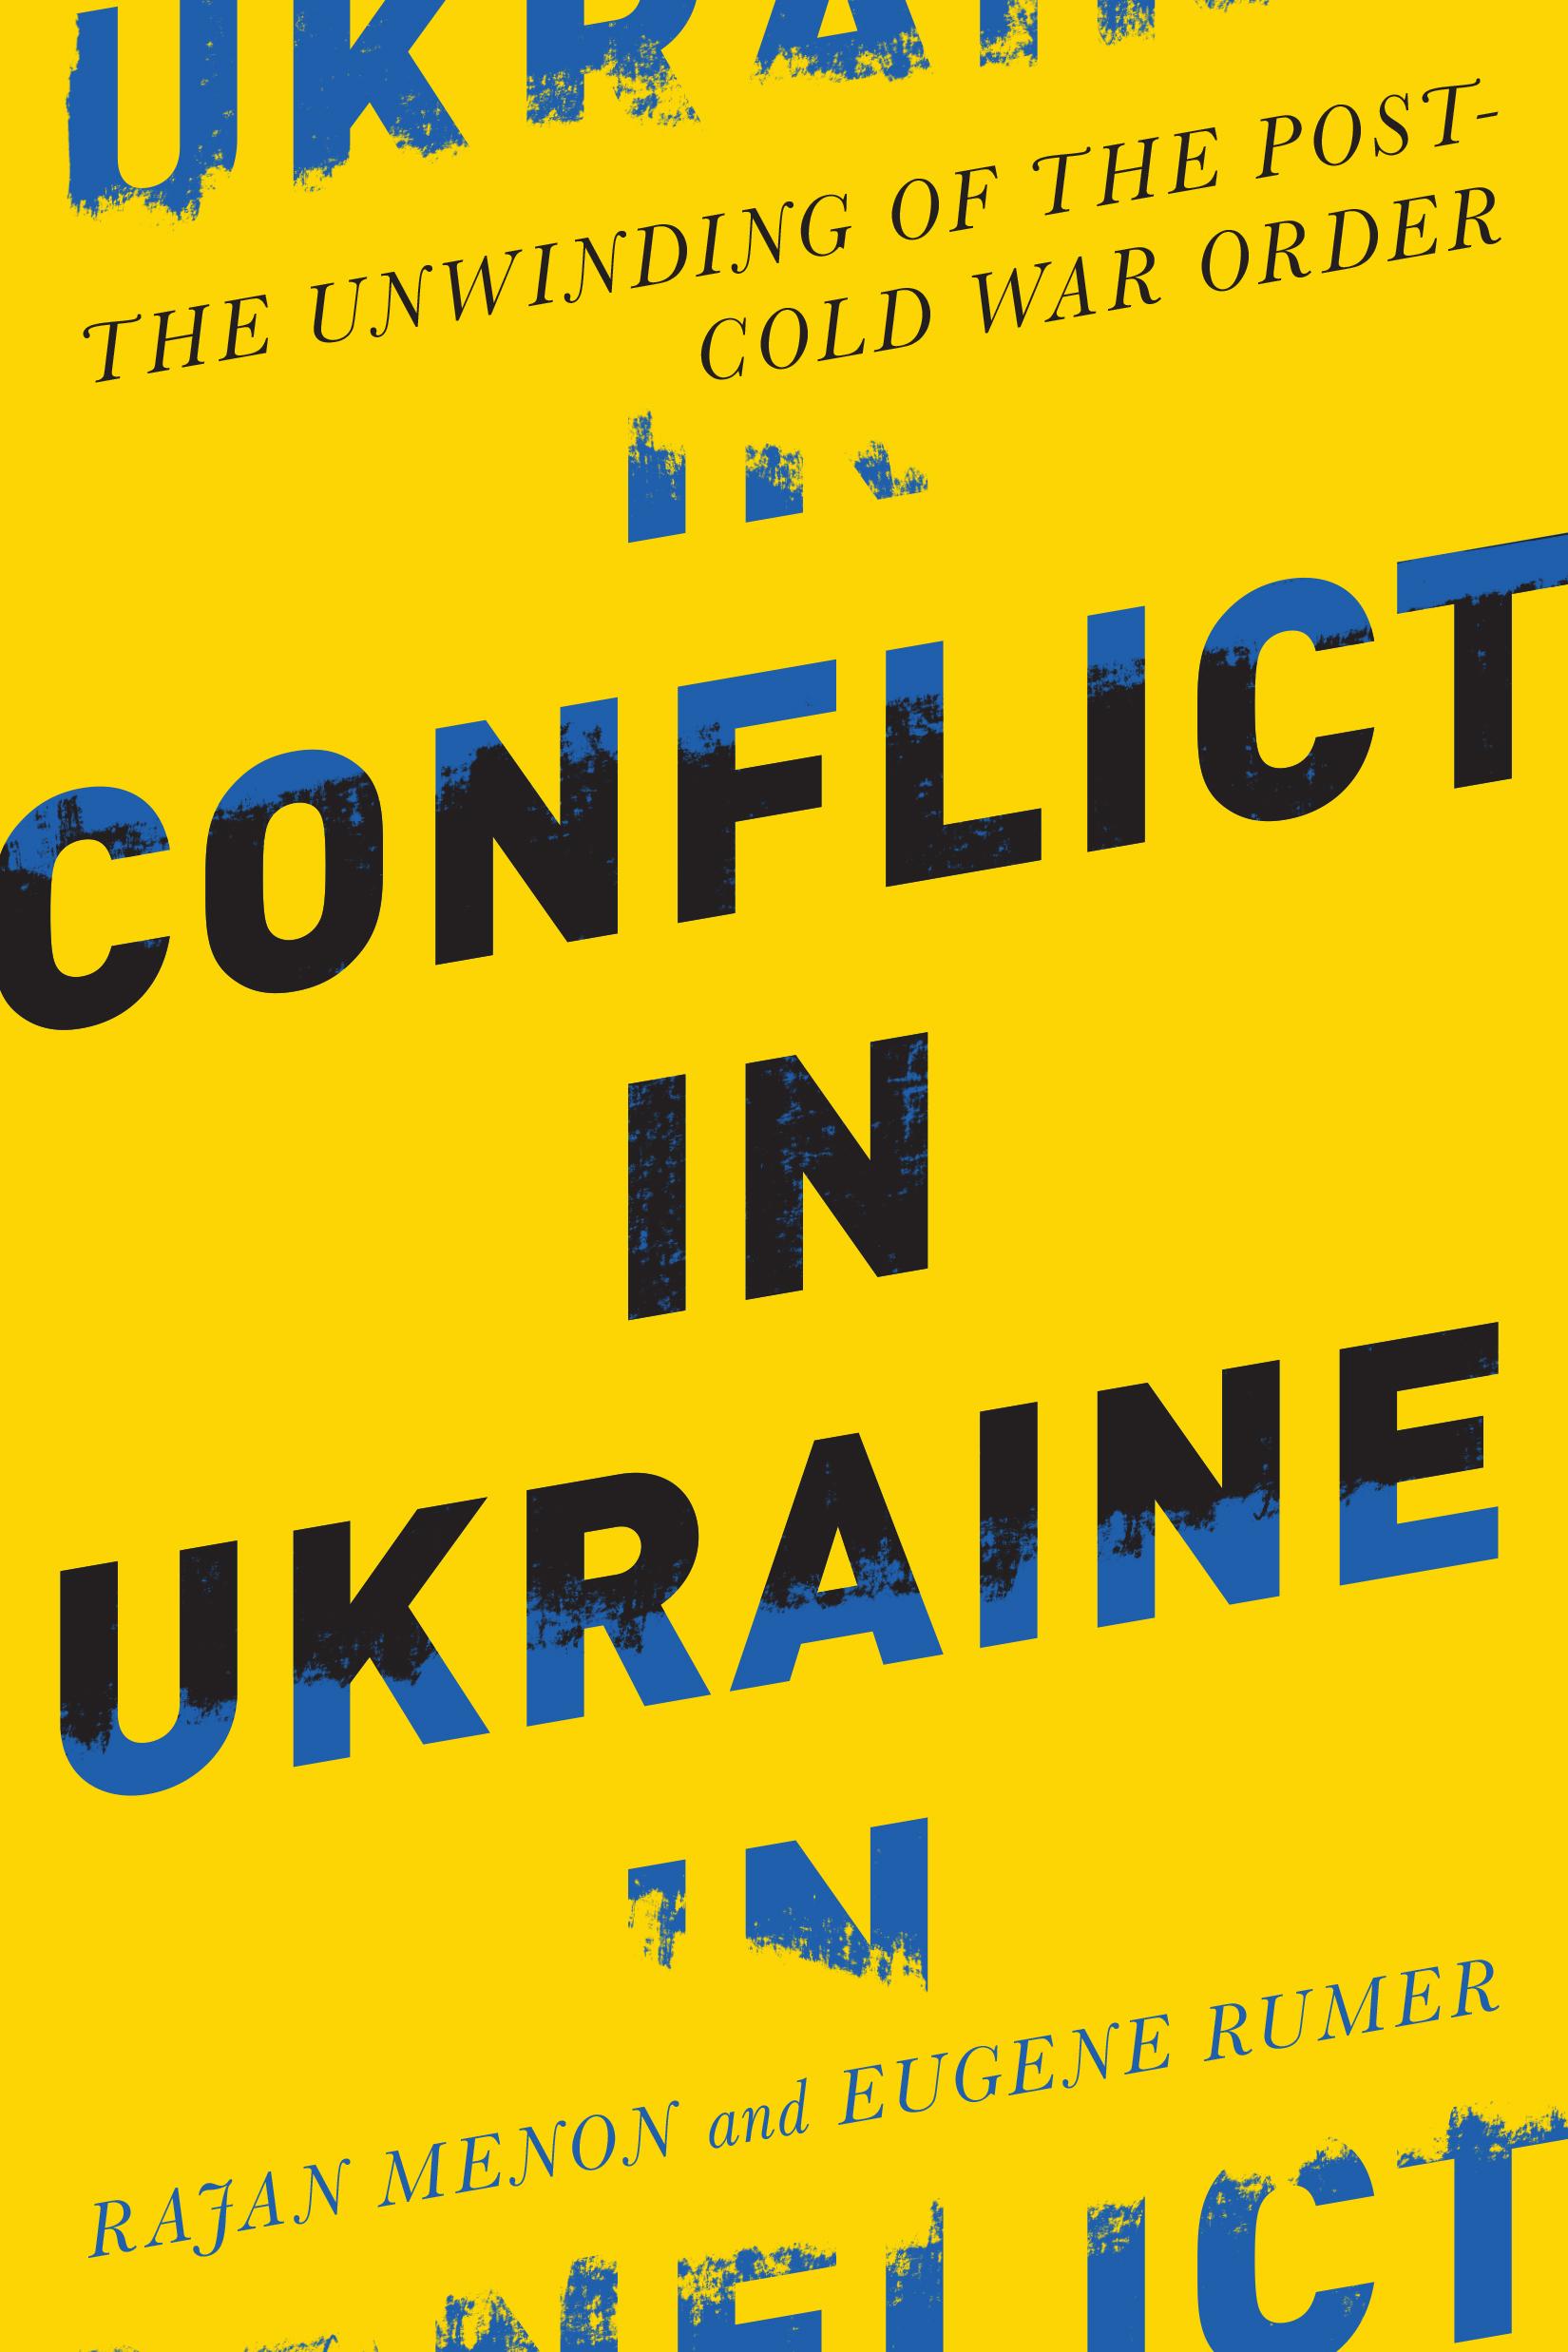 Rajan Menon ja Eugene Rumer: Conflict in Ukraine. The Unwinding of the Post-Cold War Order. MIT Press 2015, 240 s.